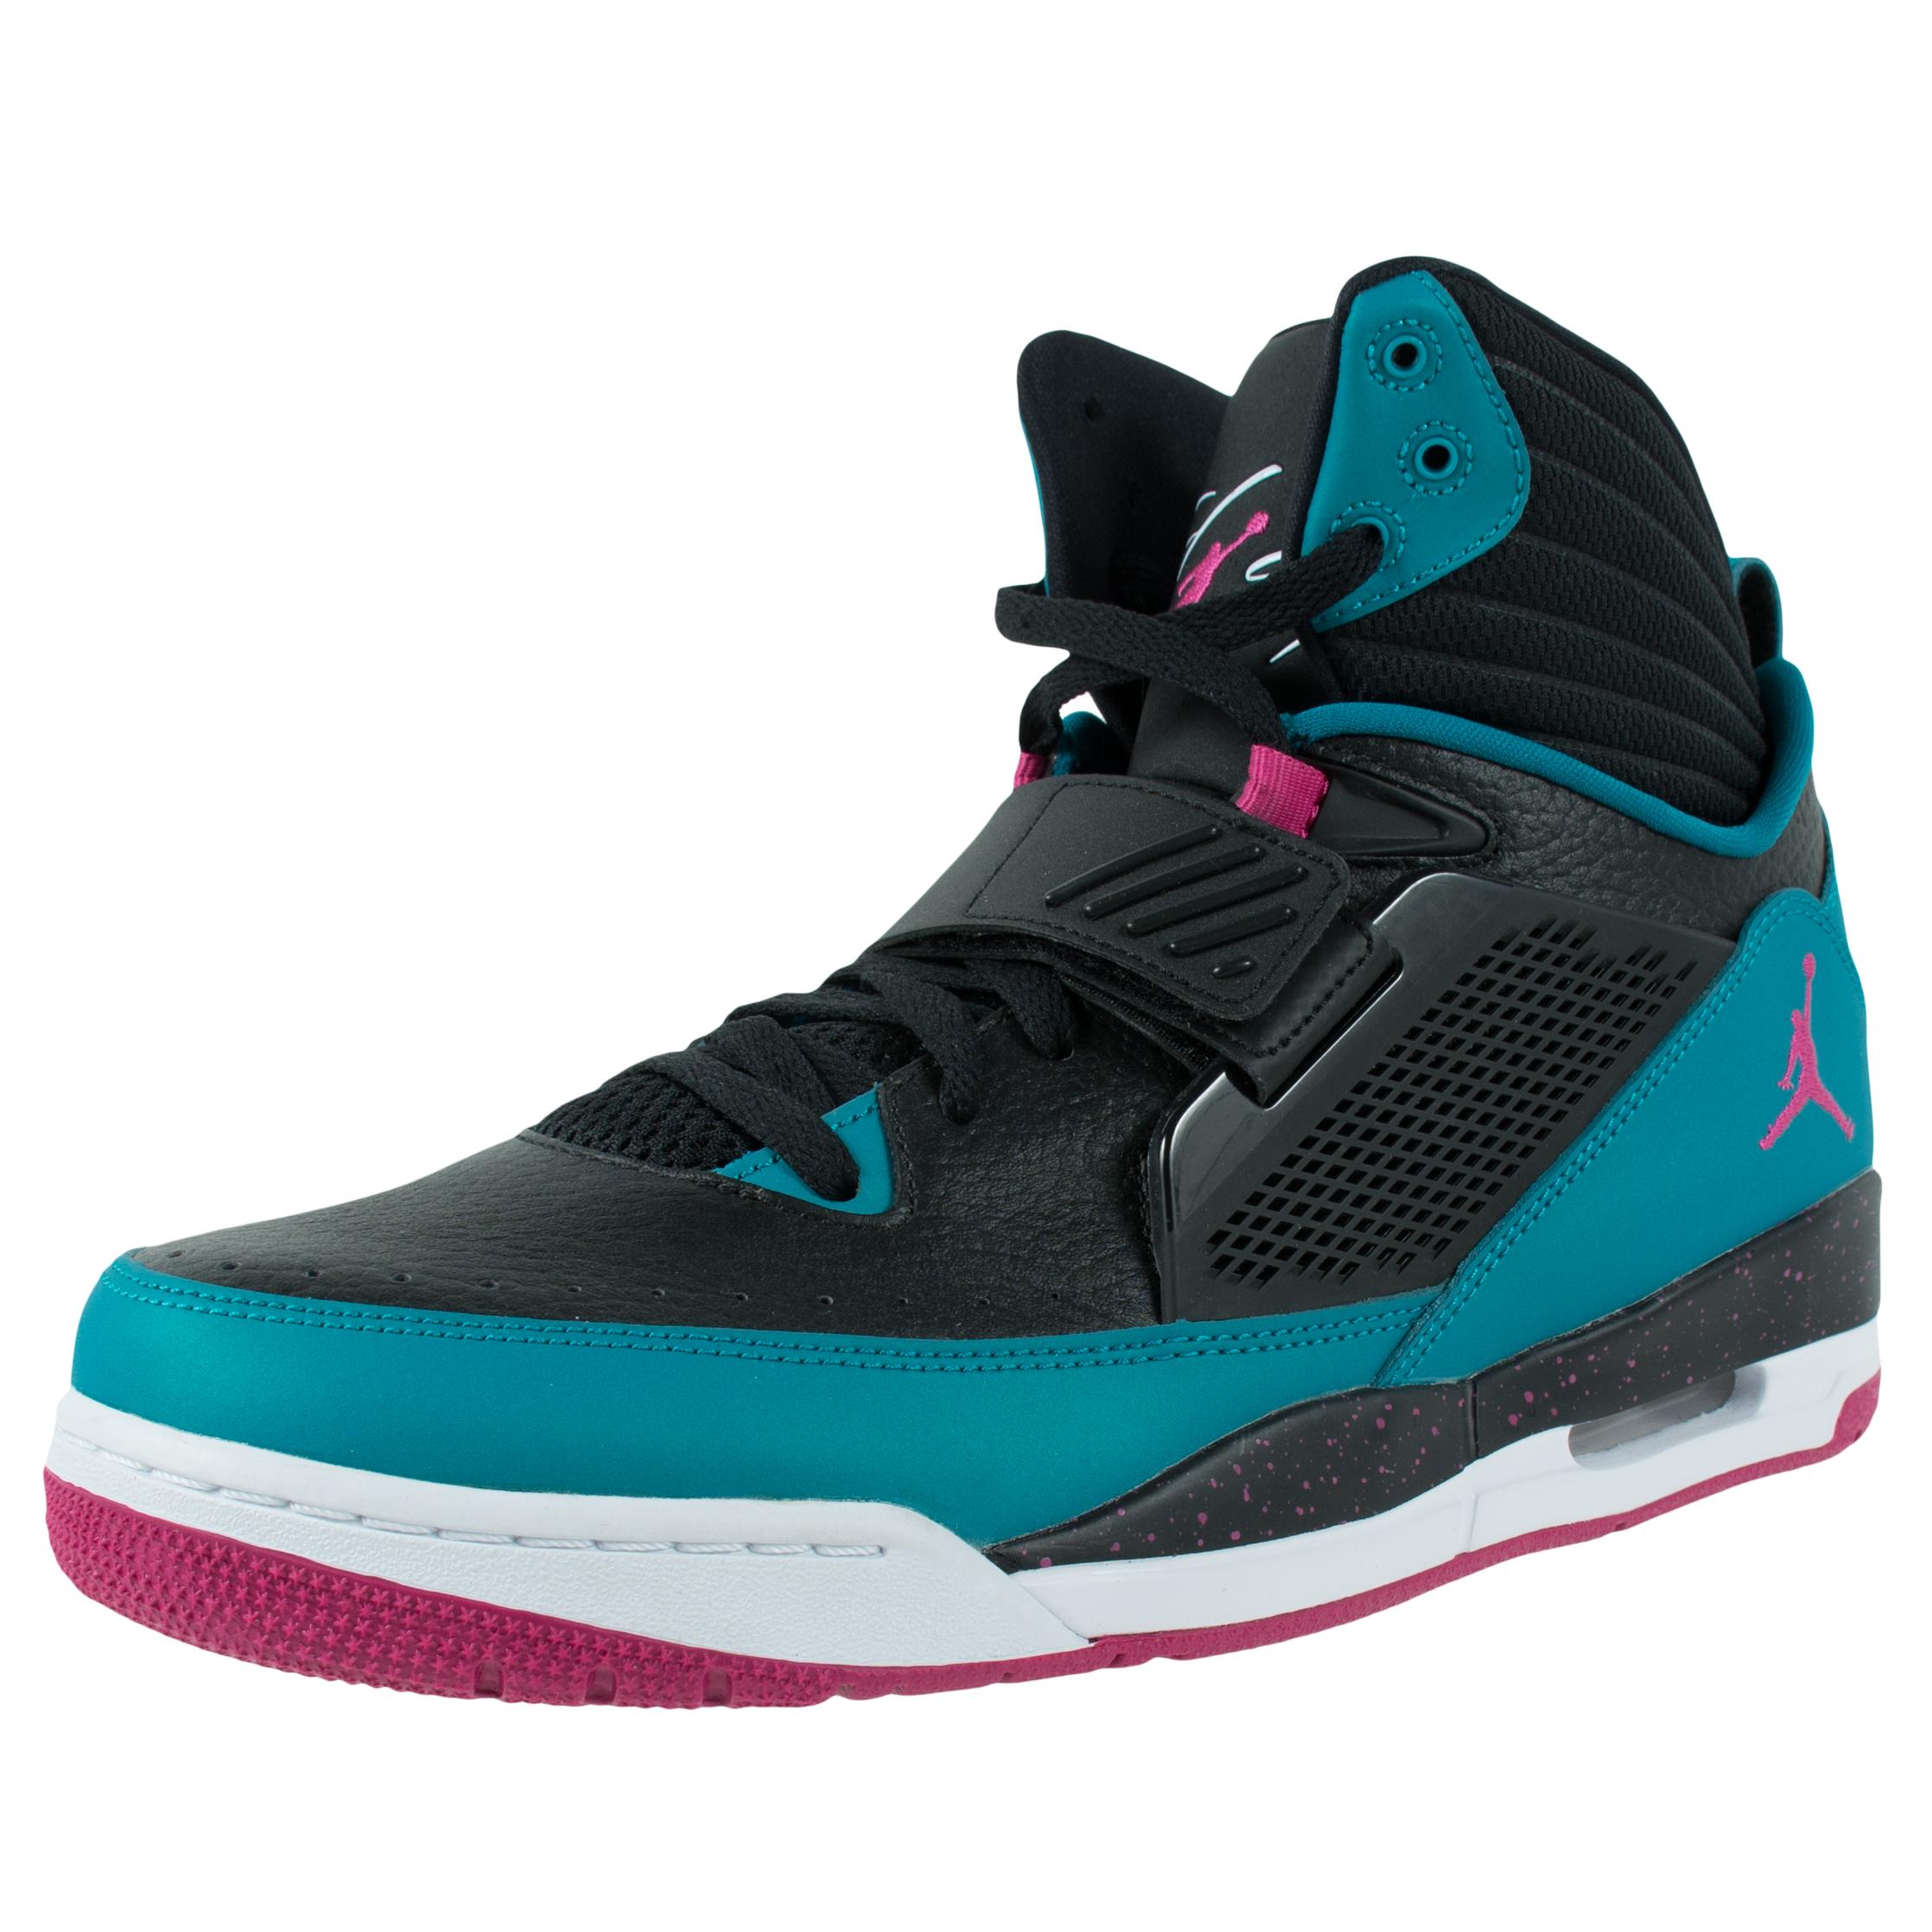 nike flight 97 basketball shoes black fusion pink